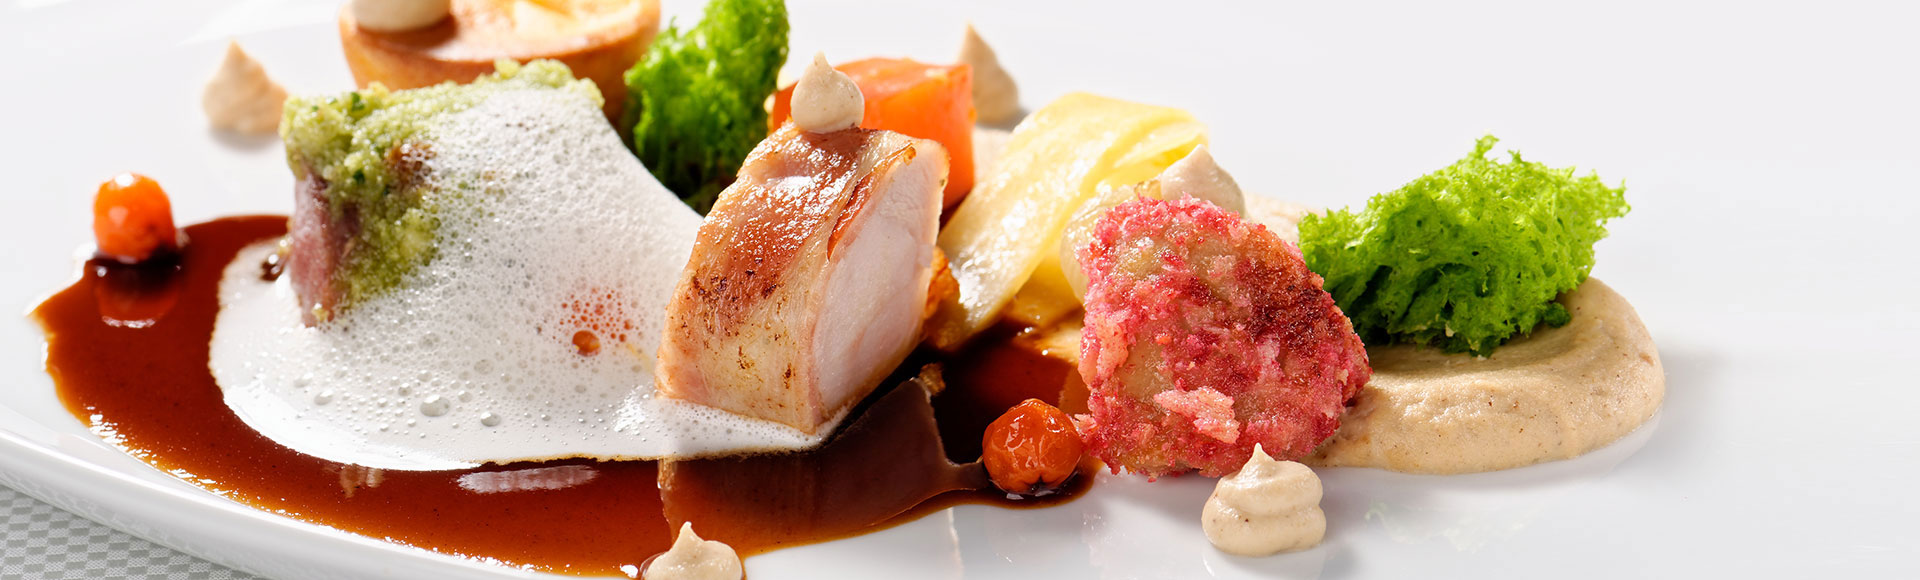 Kulinarik im Hotel Alpenwelt in Flachau